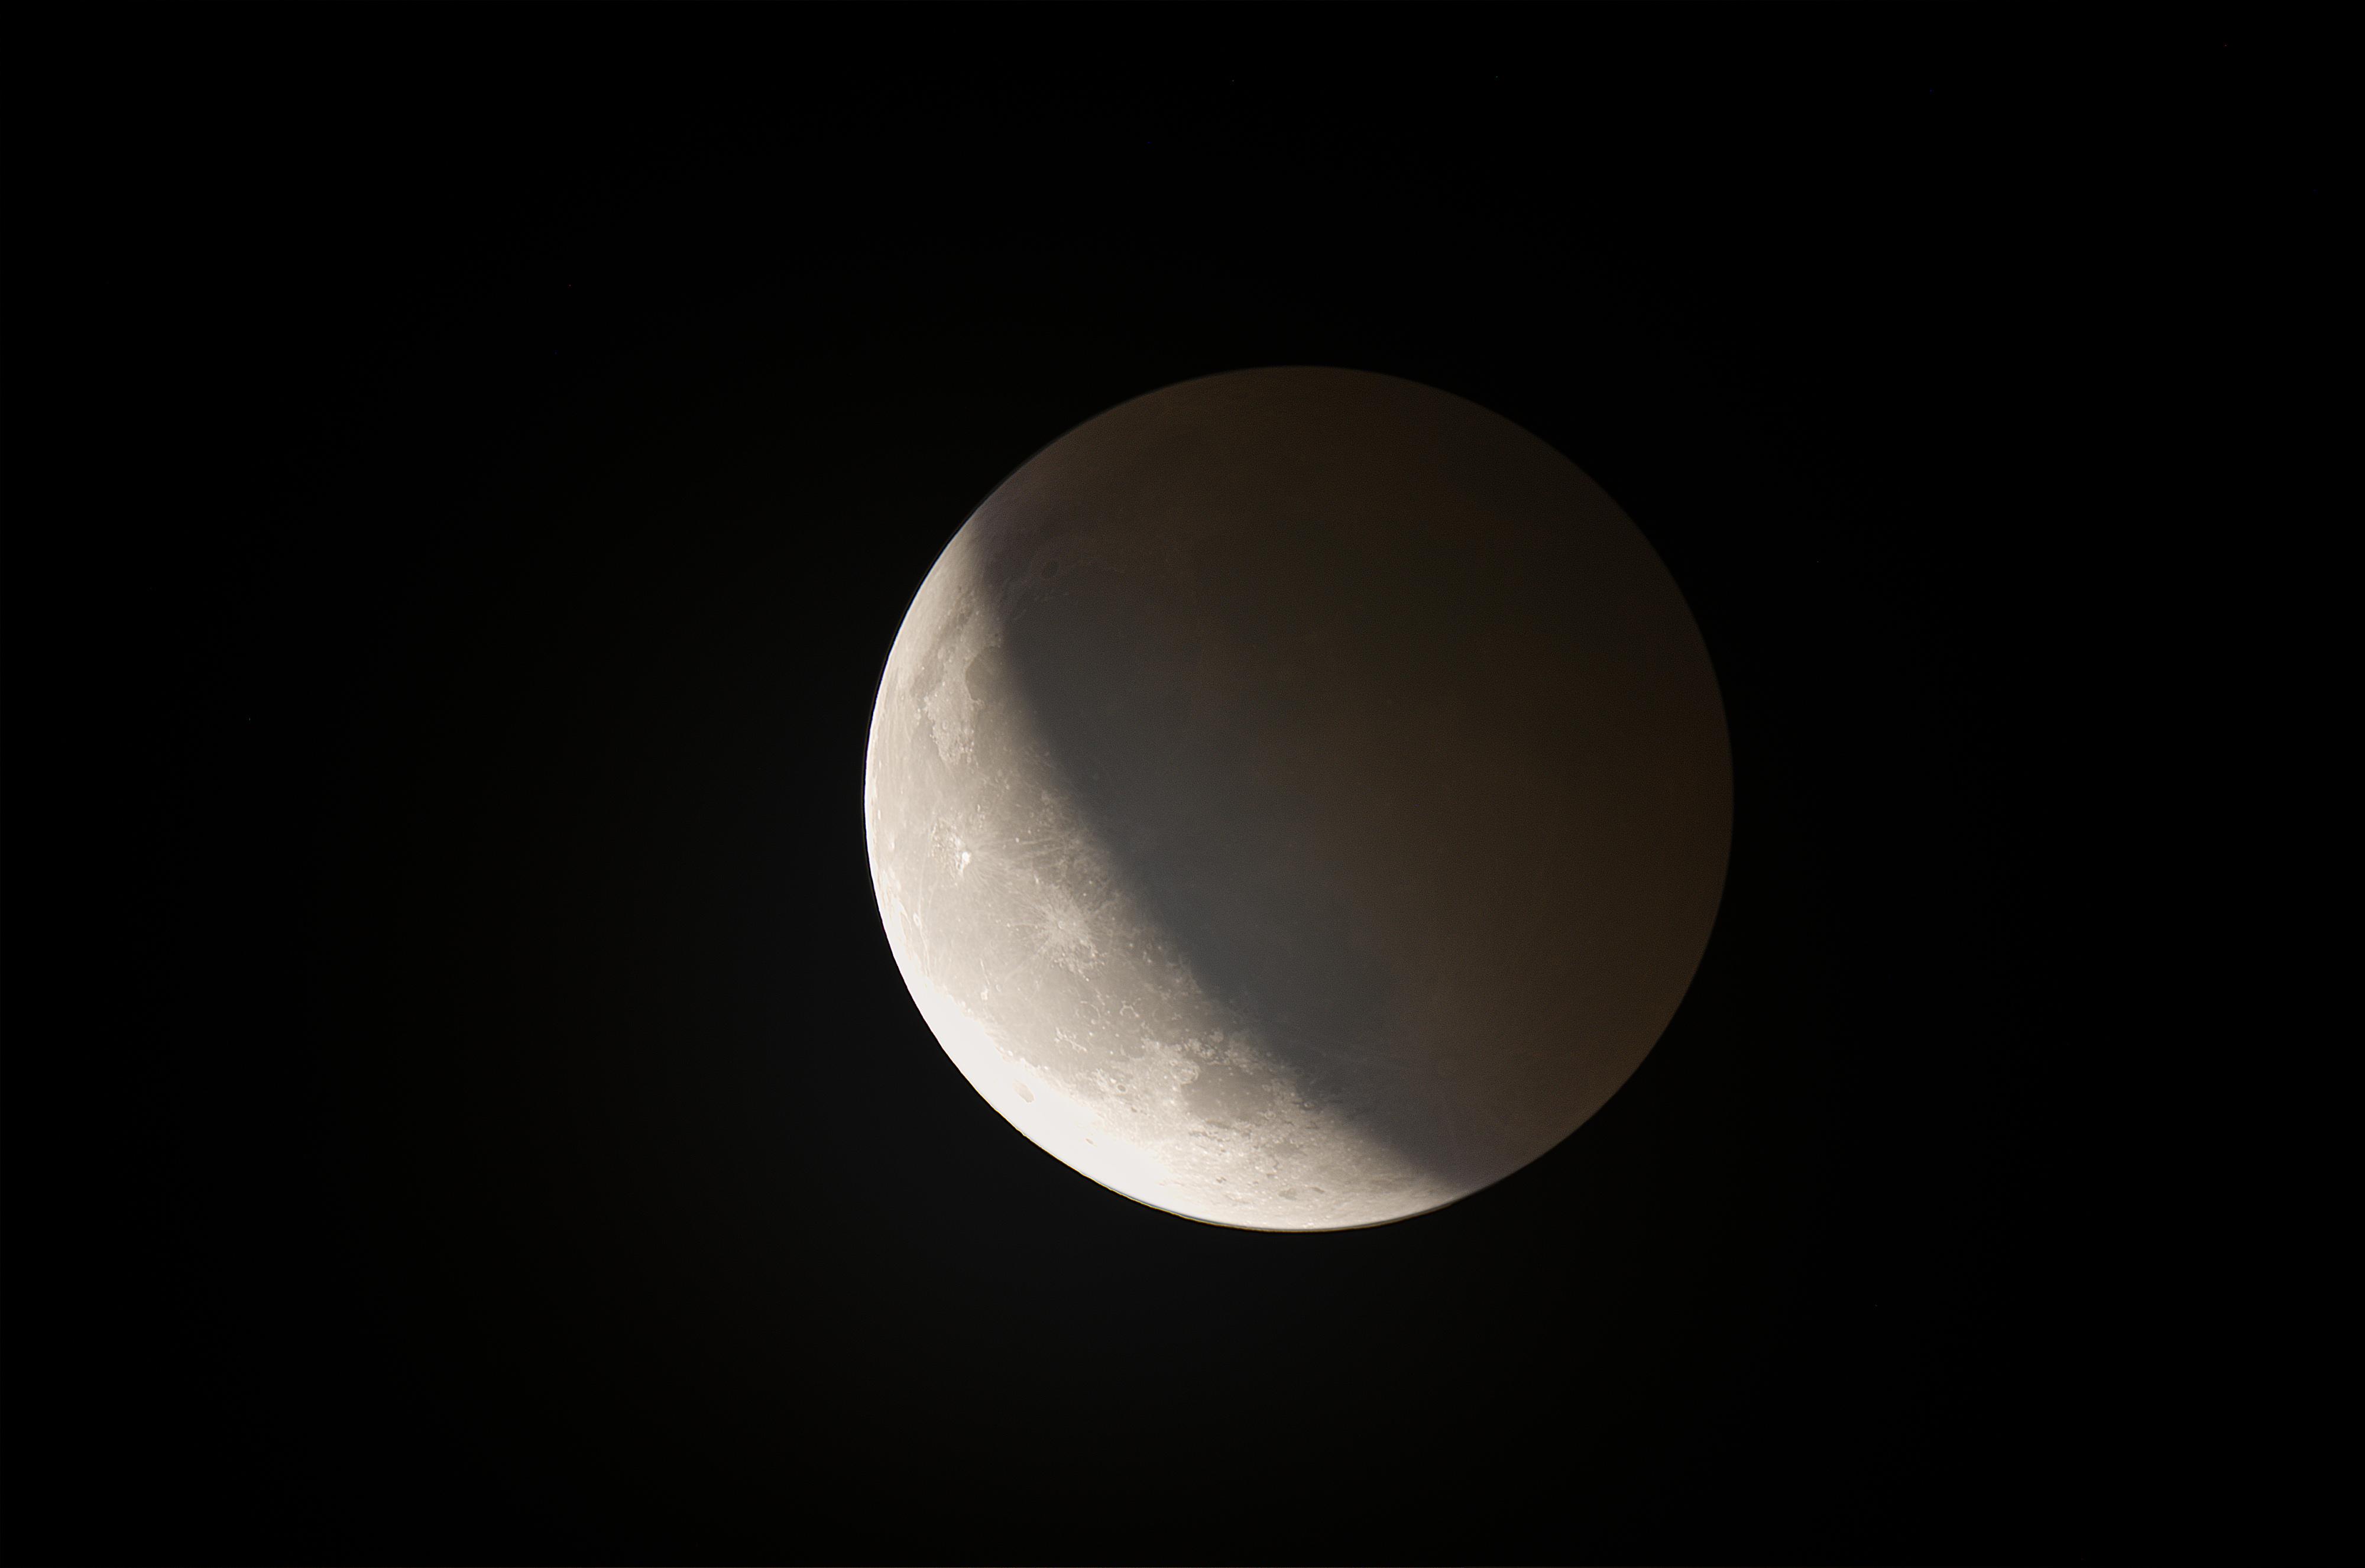 Eclipse de lune 27 juillet 2018